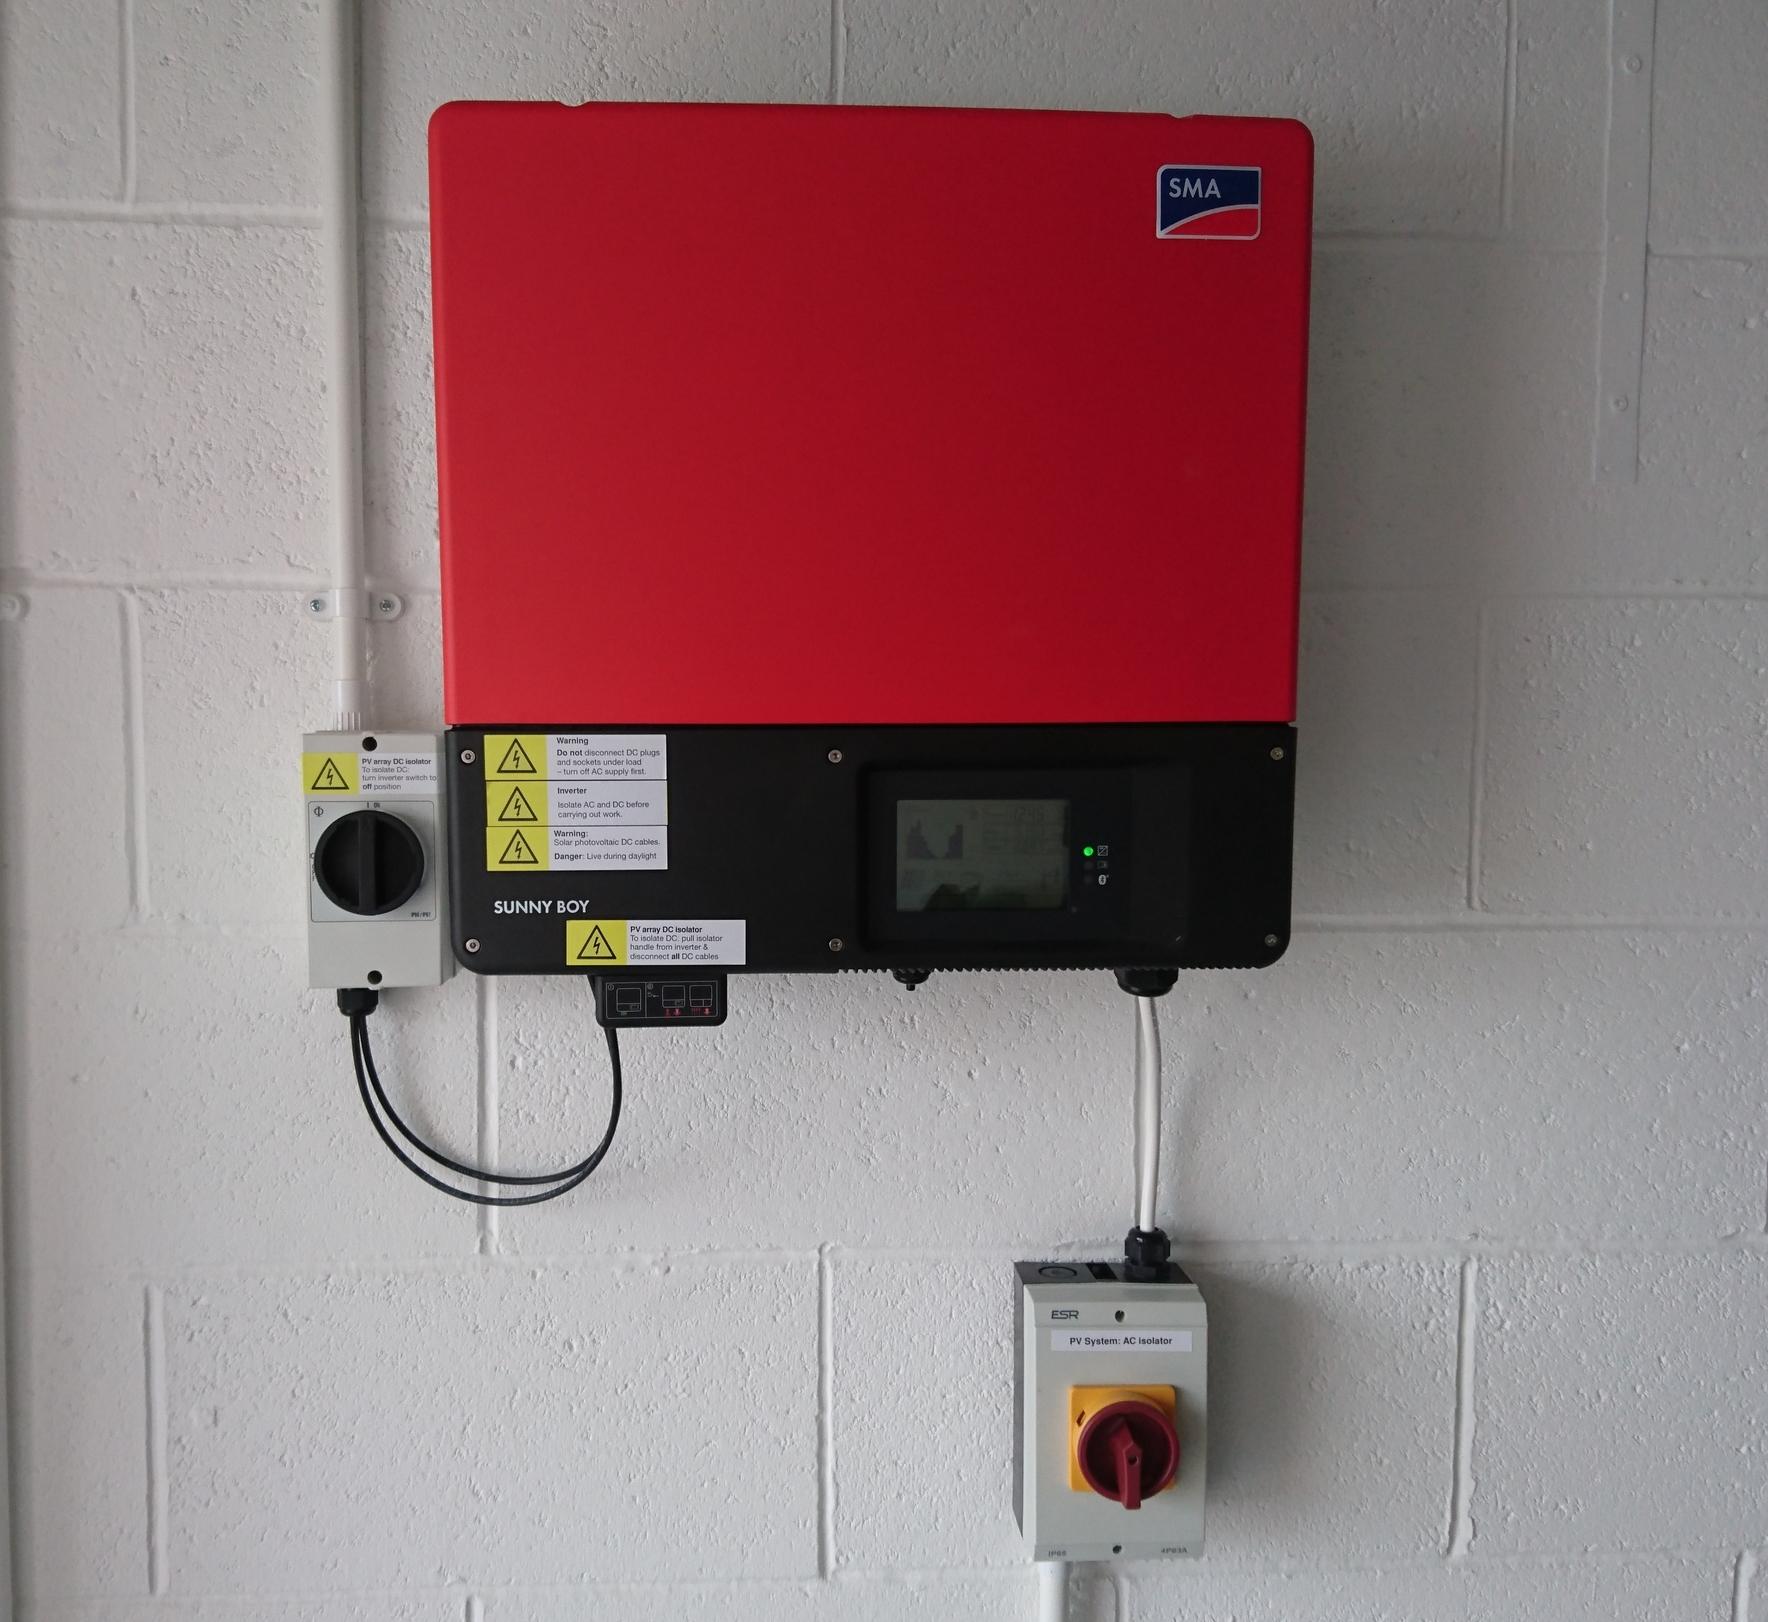 (figure 2) Glowsolar inverter installation